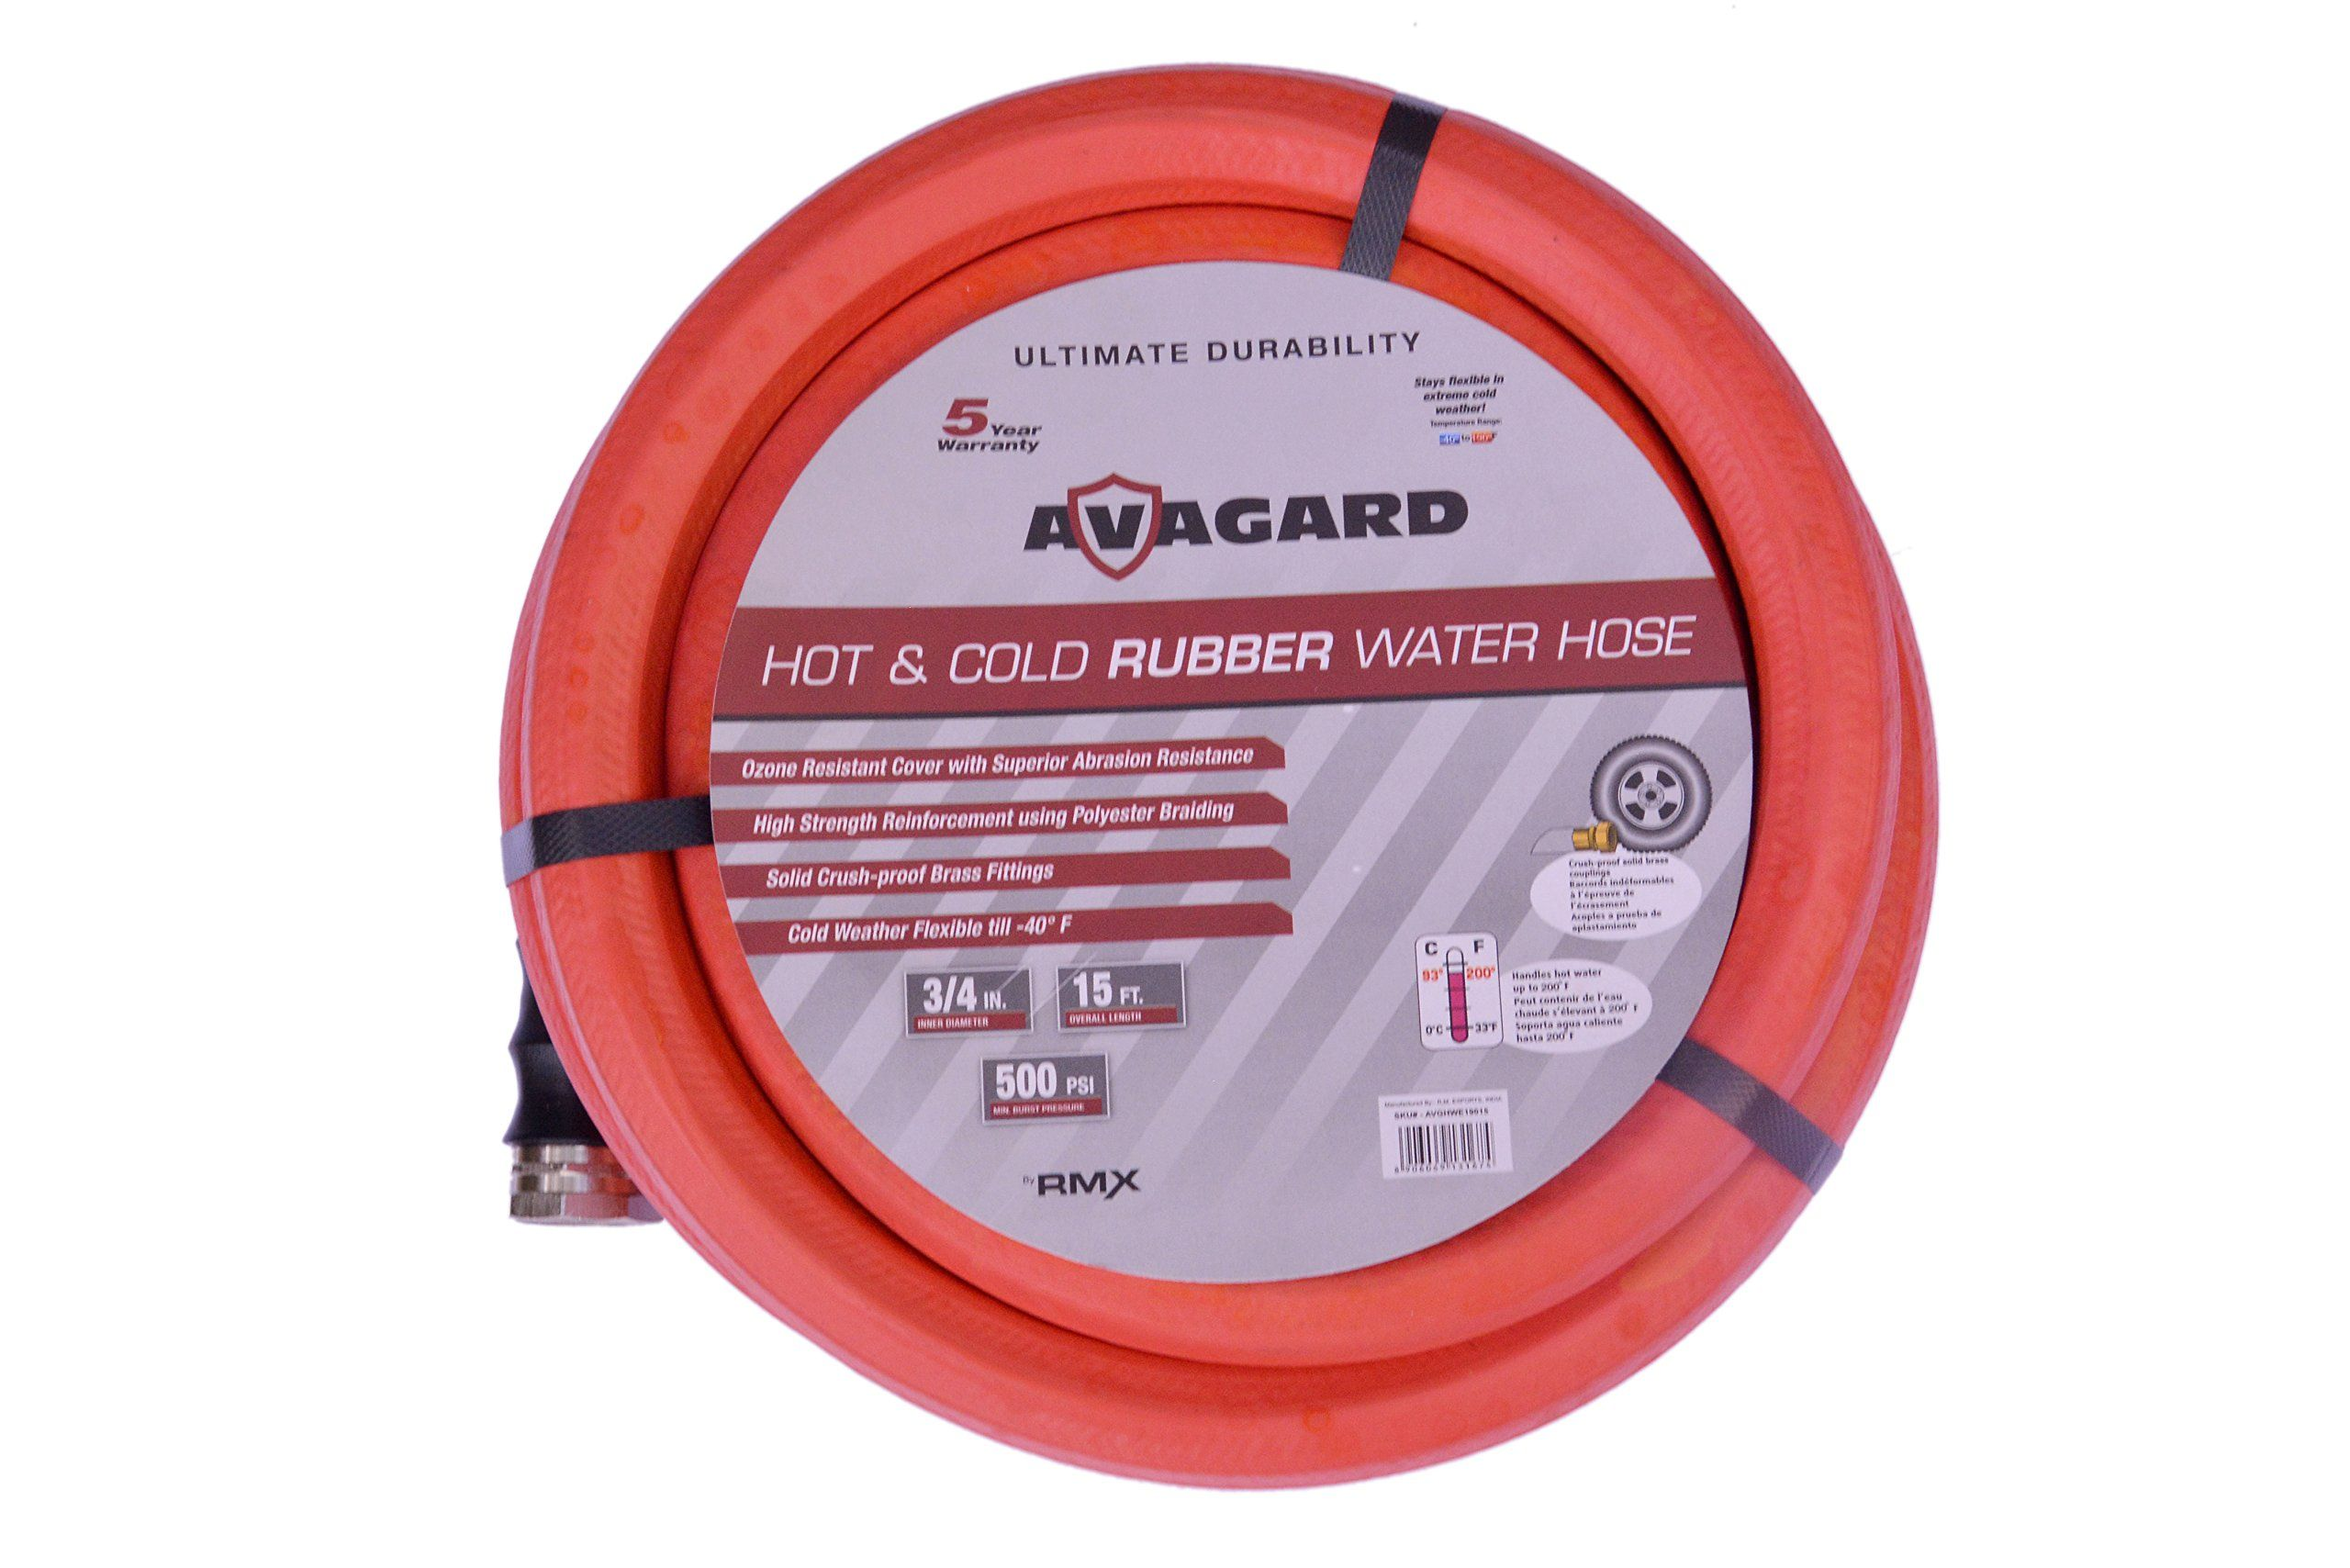 "Avagard 3/4"" X 15 Foot Red Rubber Water & Garden Hose"